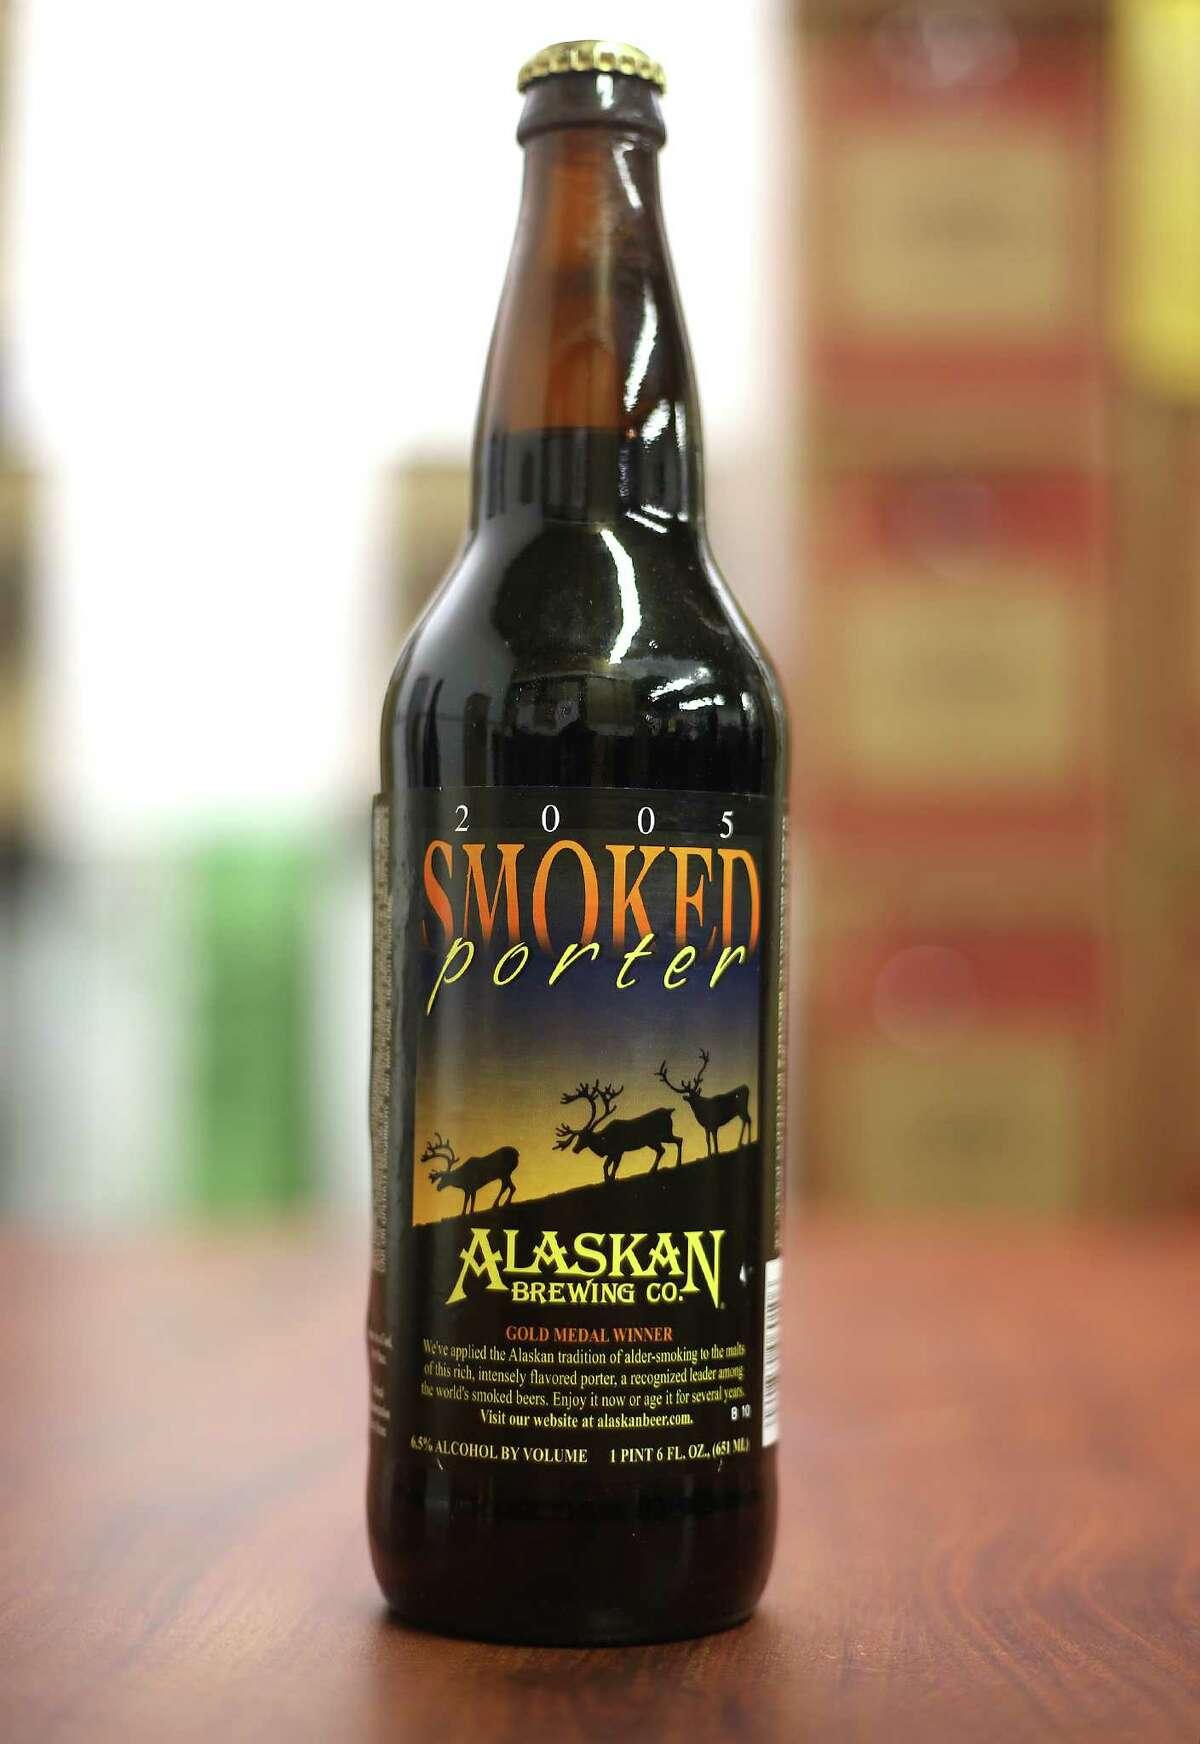 Alaska Alaskan Brewing Co.